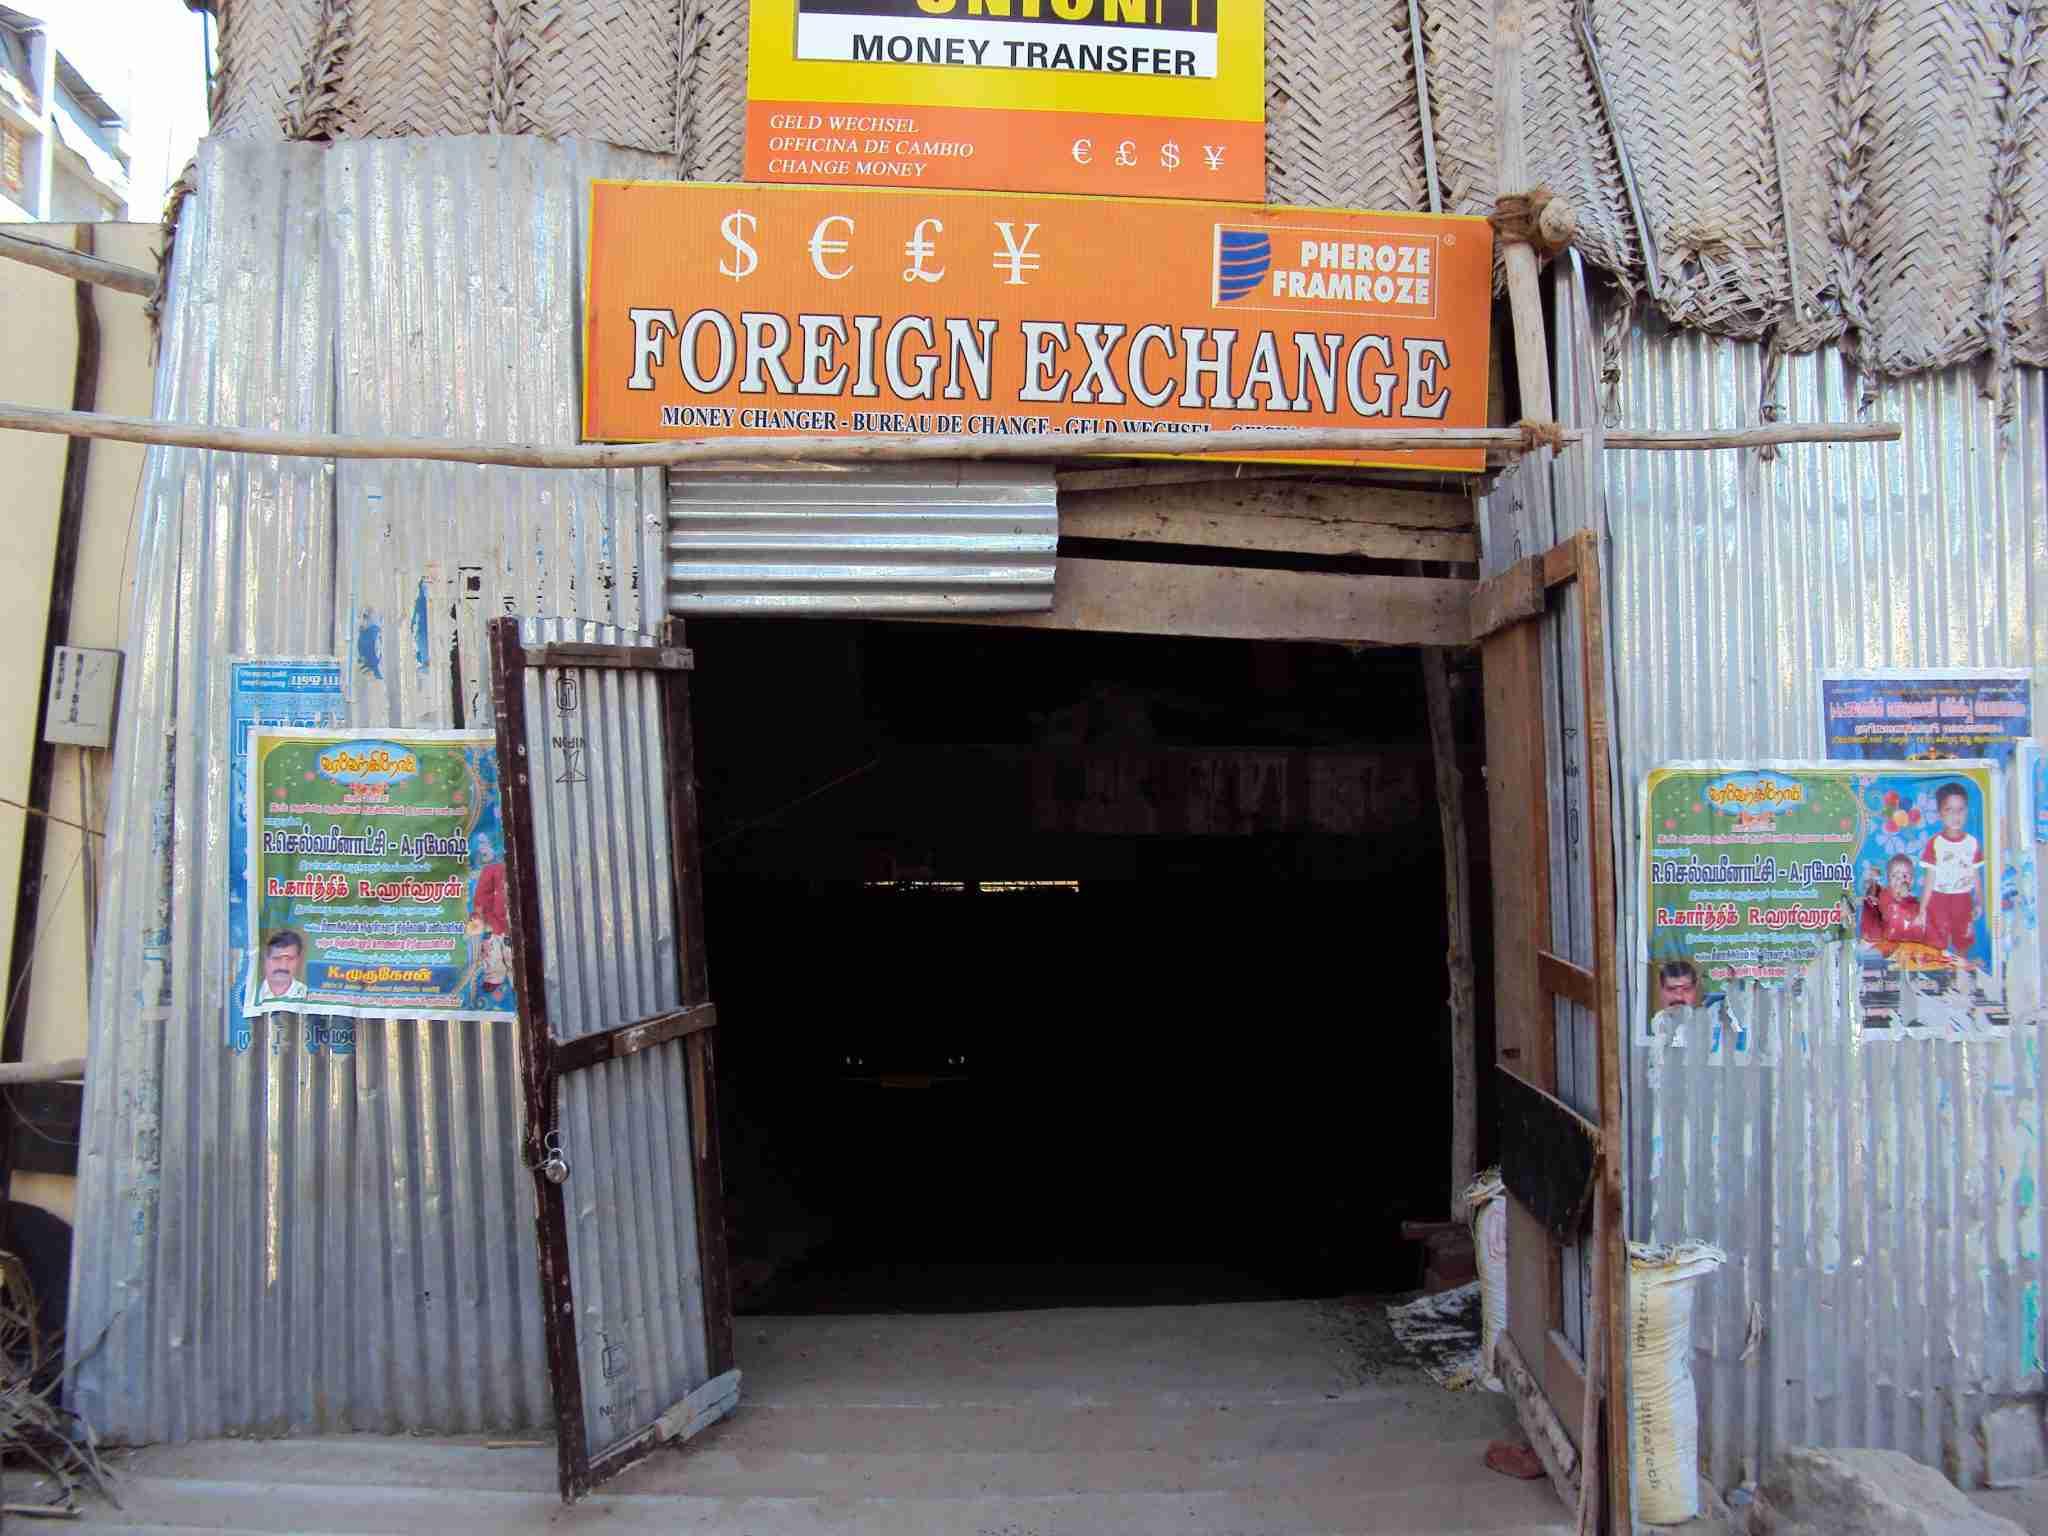 A not very trustworthy money exchange